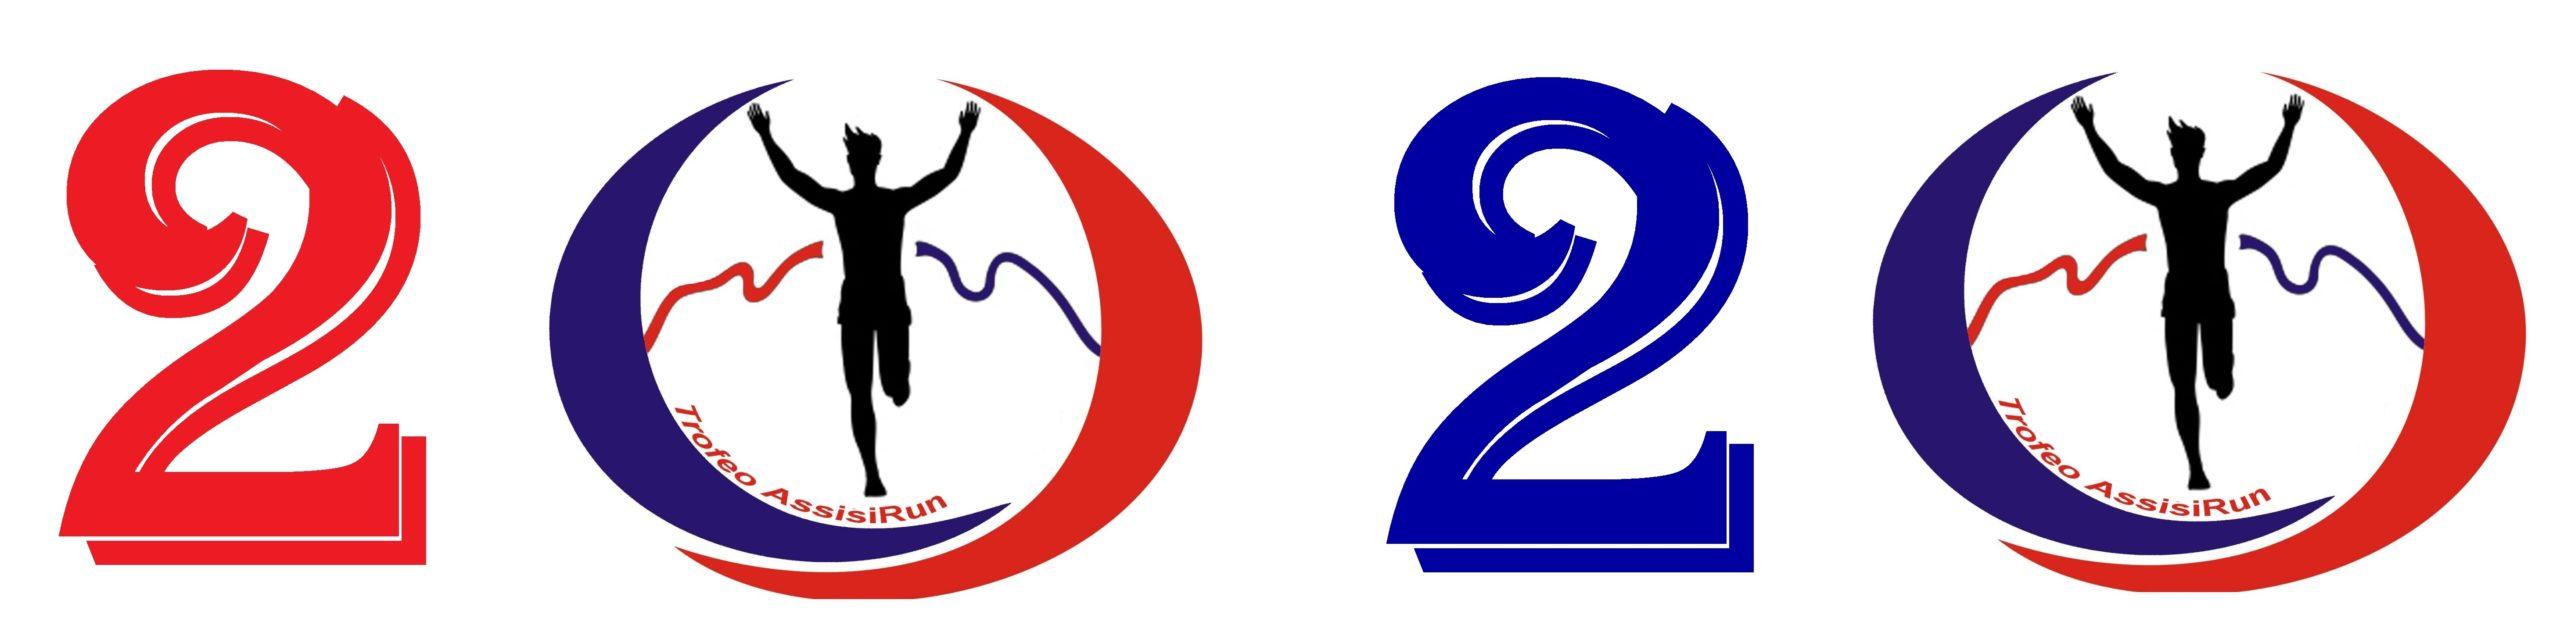 logo-trofeo-assisirun-2020